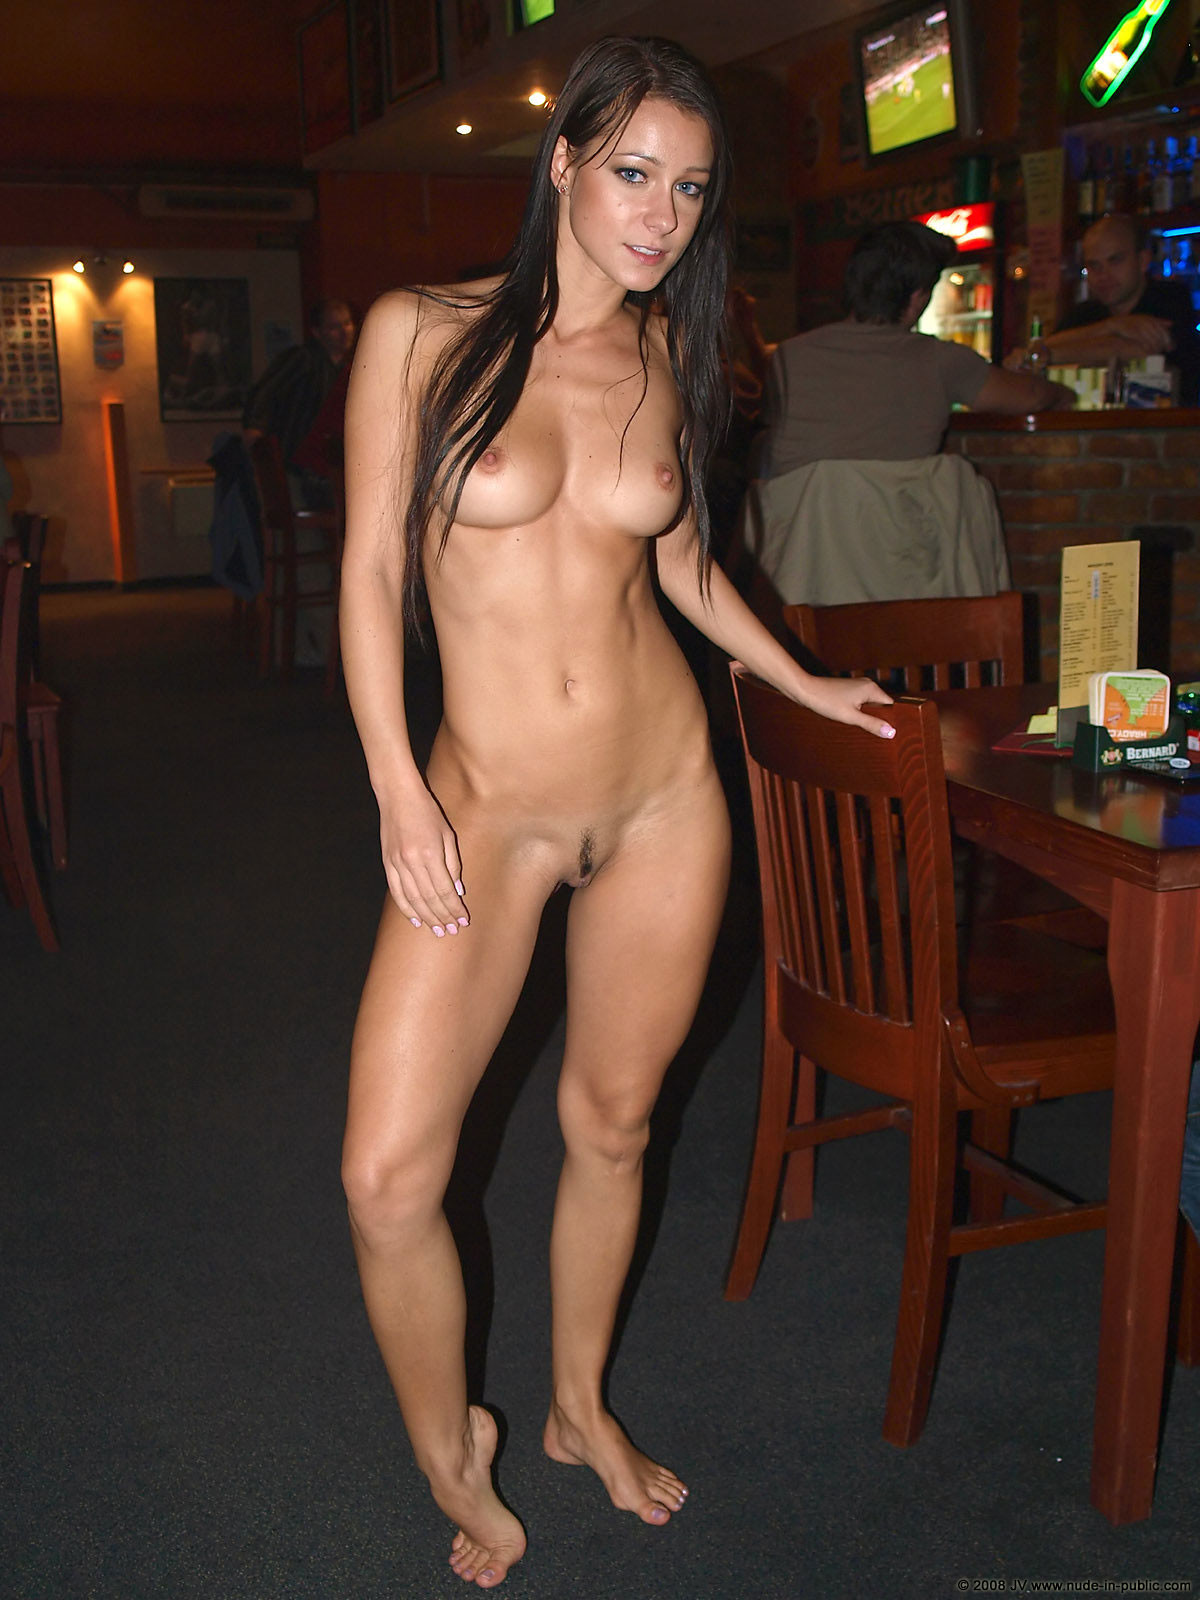 melisa-pub-beer-bar-girl-nude-in-public-92